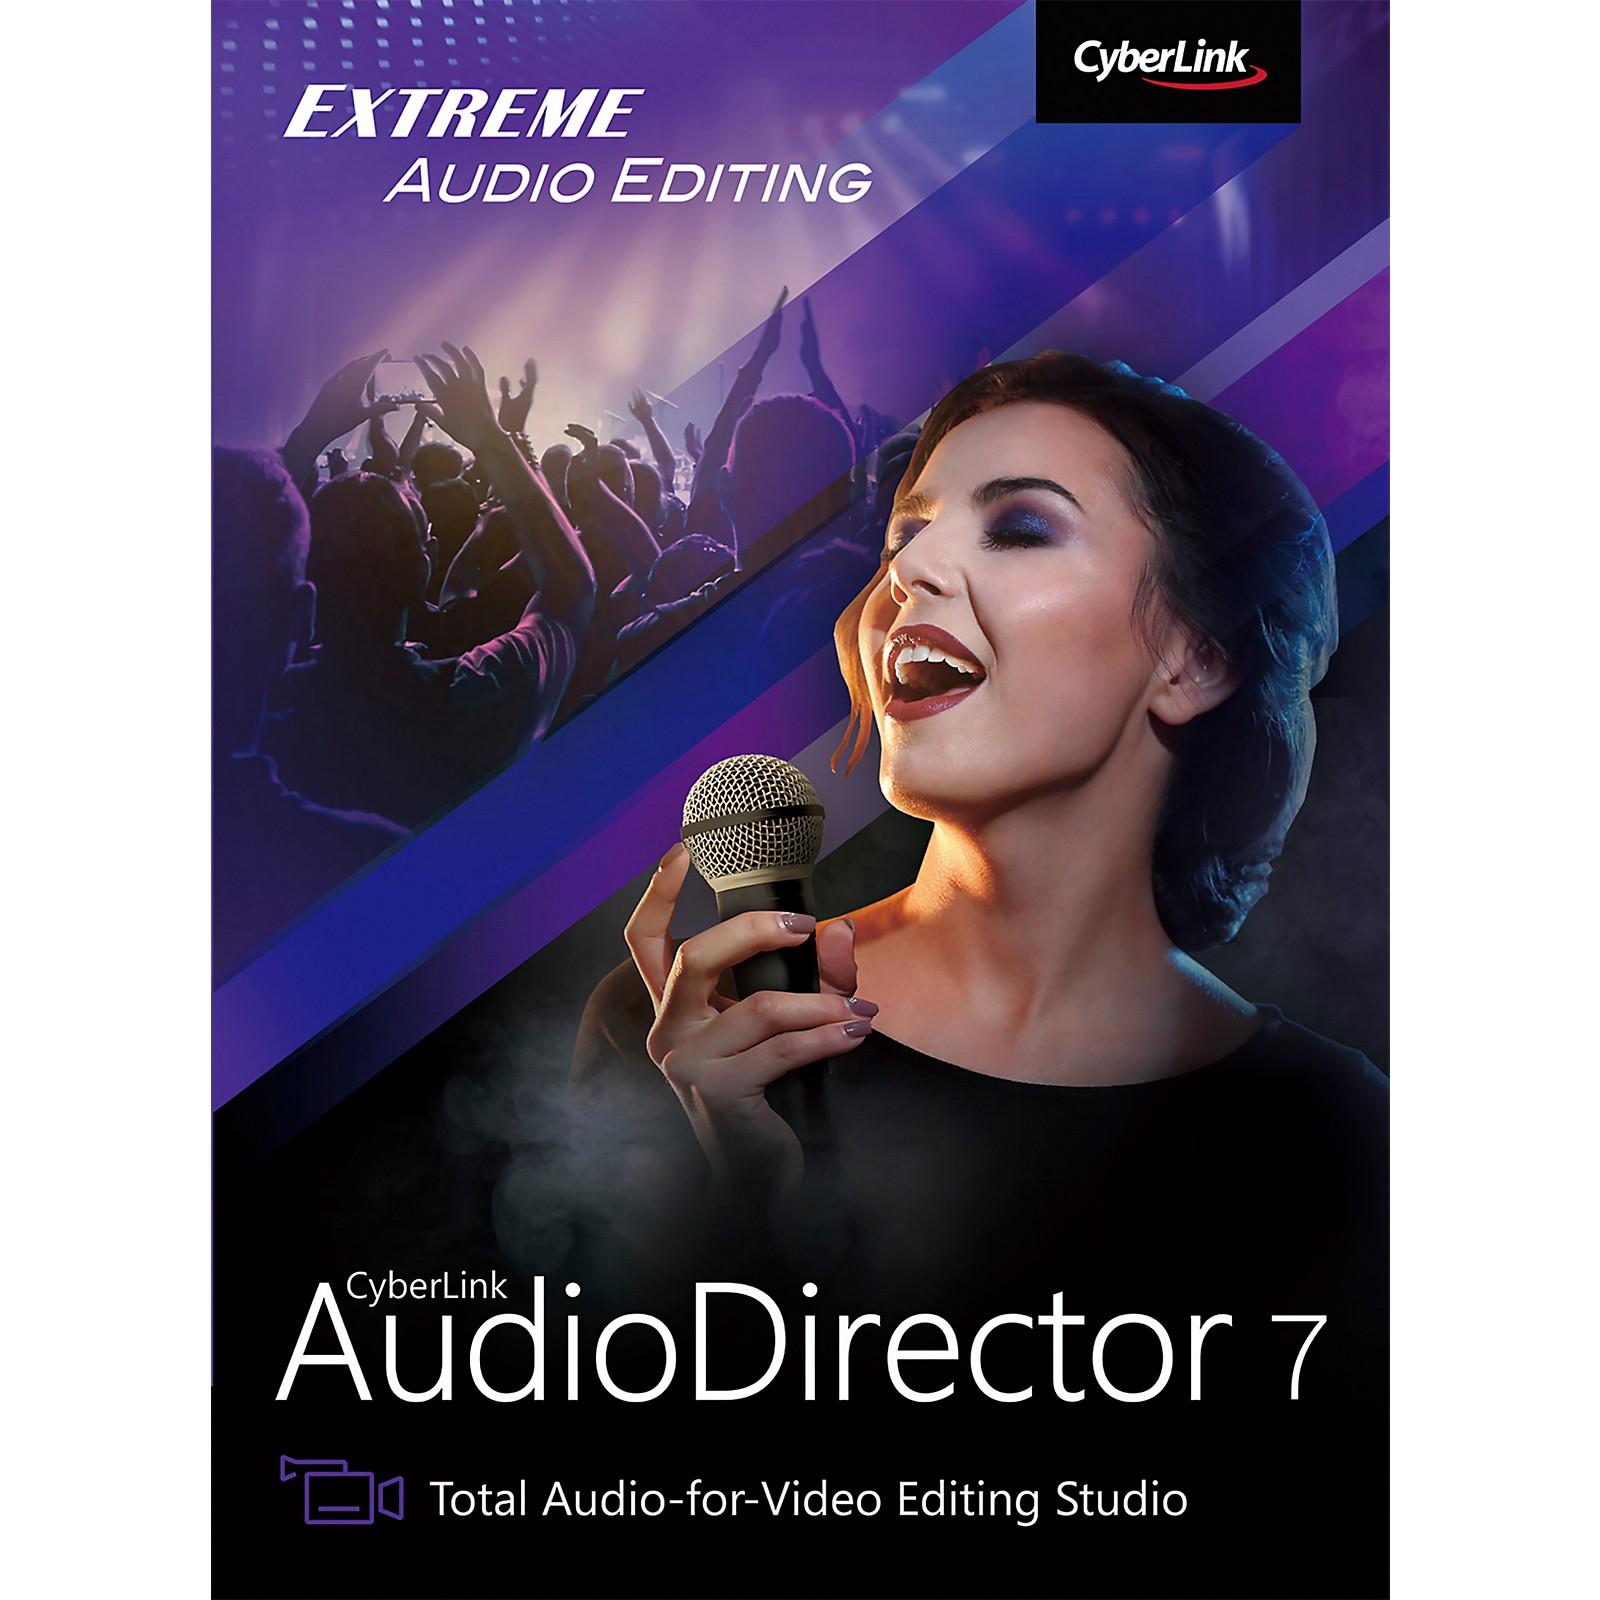 CyberLink AudioDirector 7 Ultra